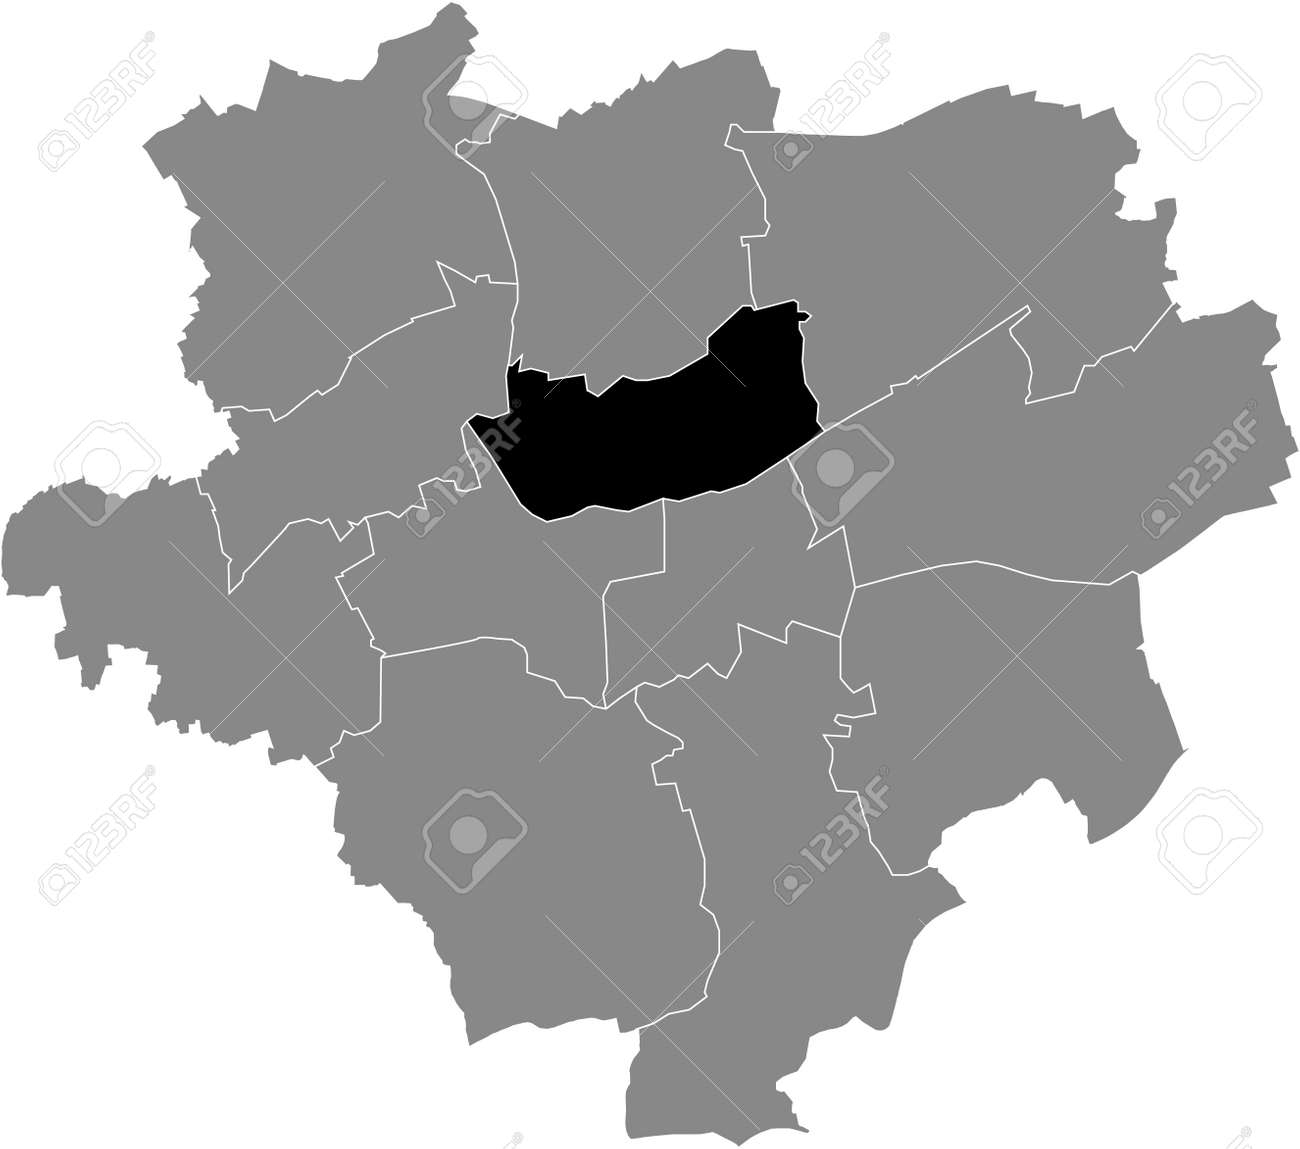 Black location map of the Dortmunder Stadtbezirk Innenstadt-Nord district inside the German regional capital city of Dortmund, Germany - 169986373